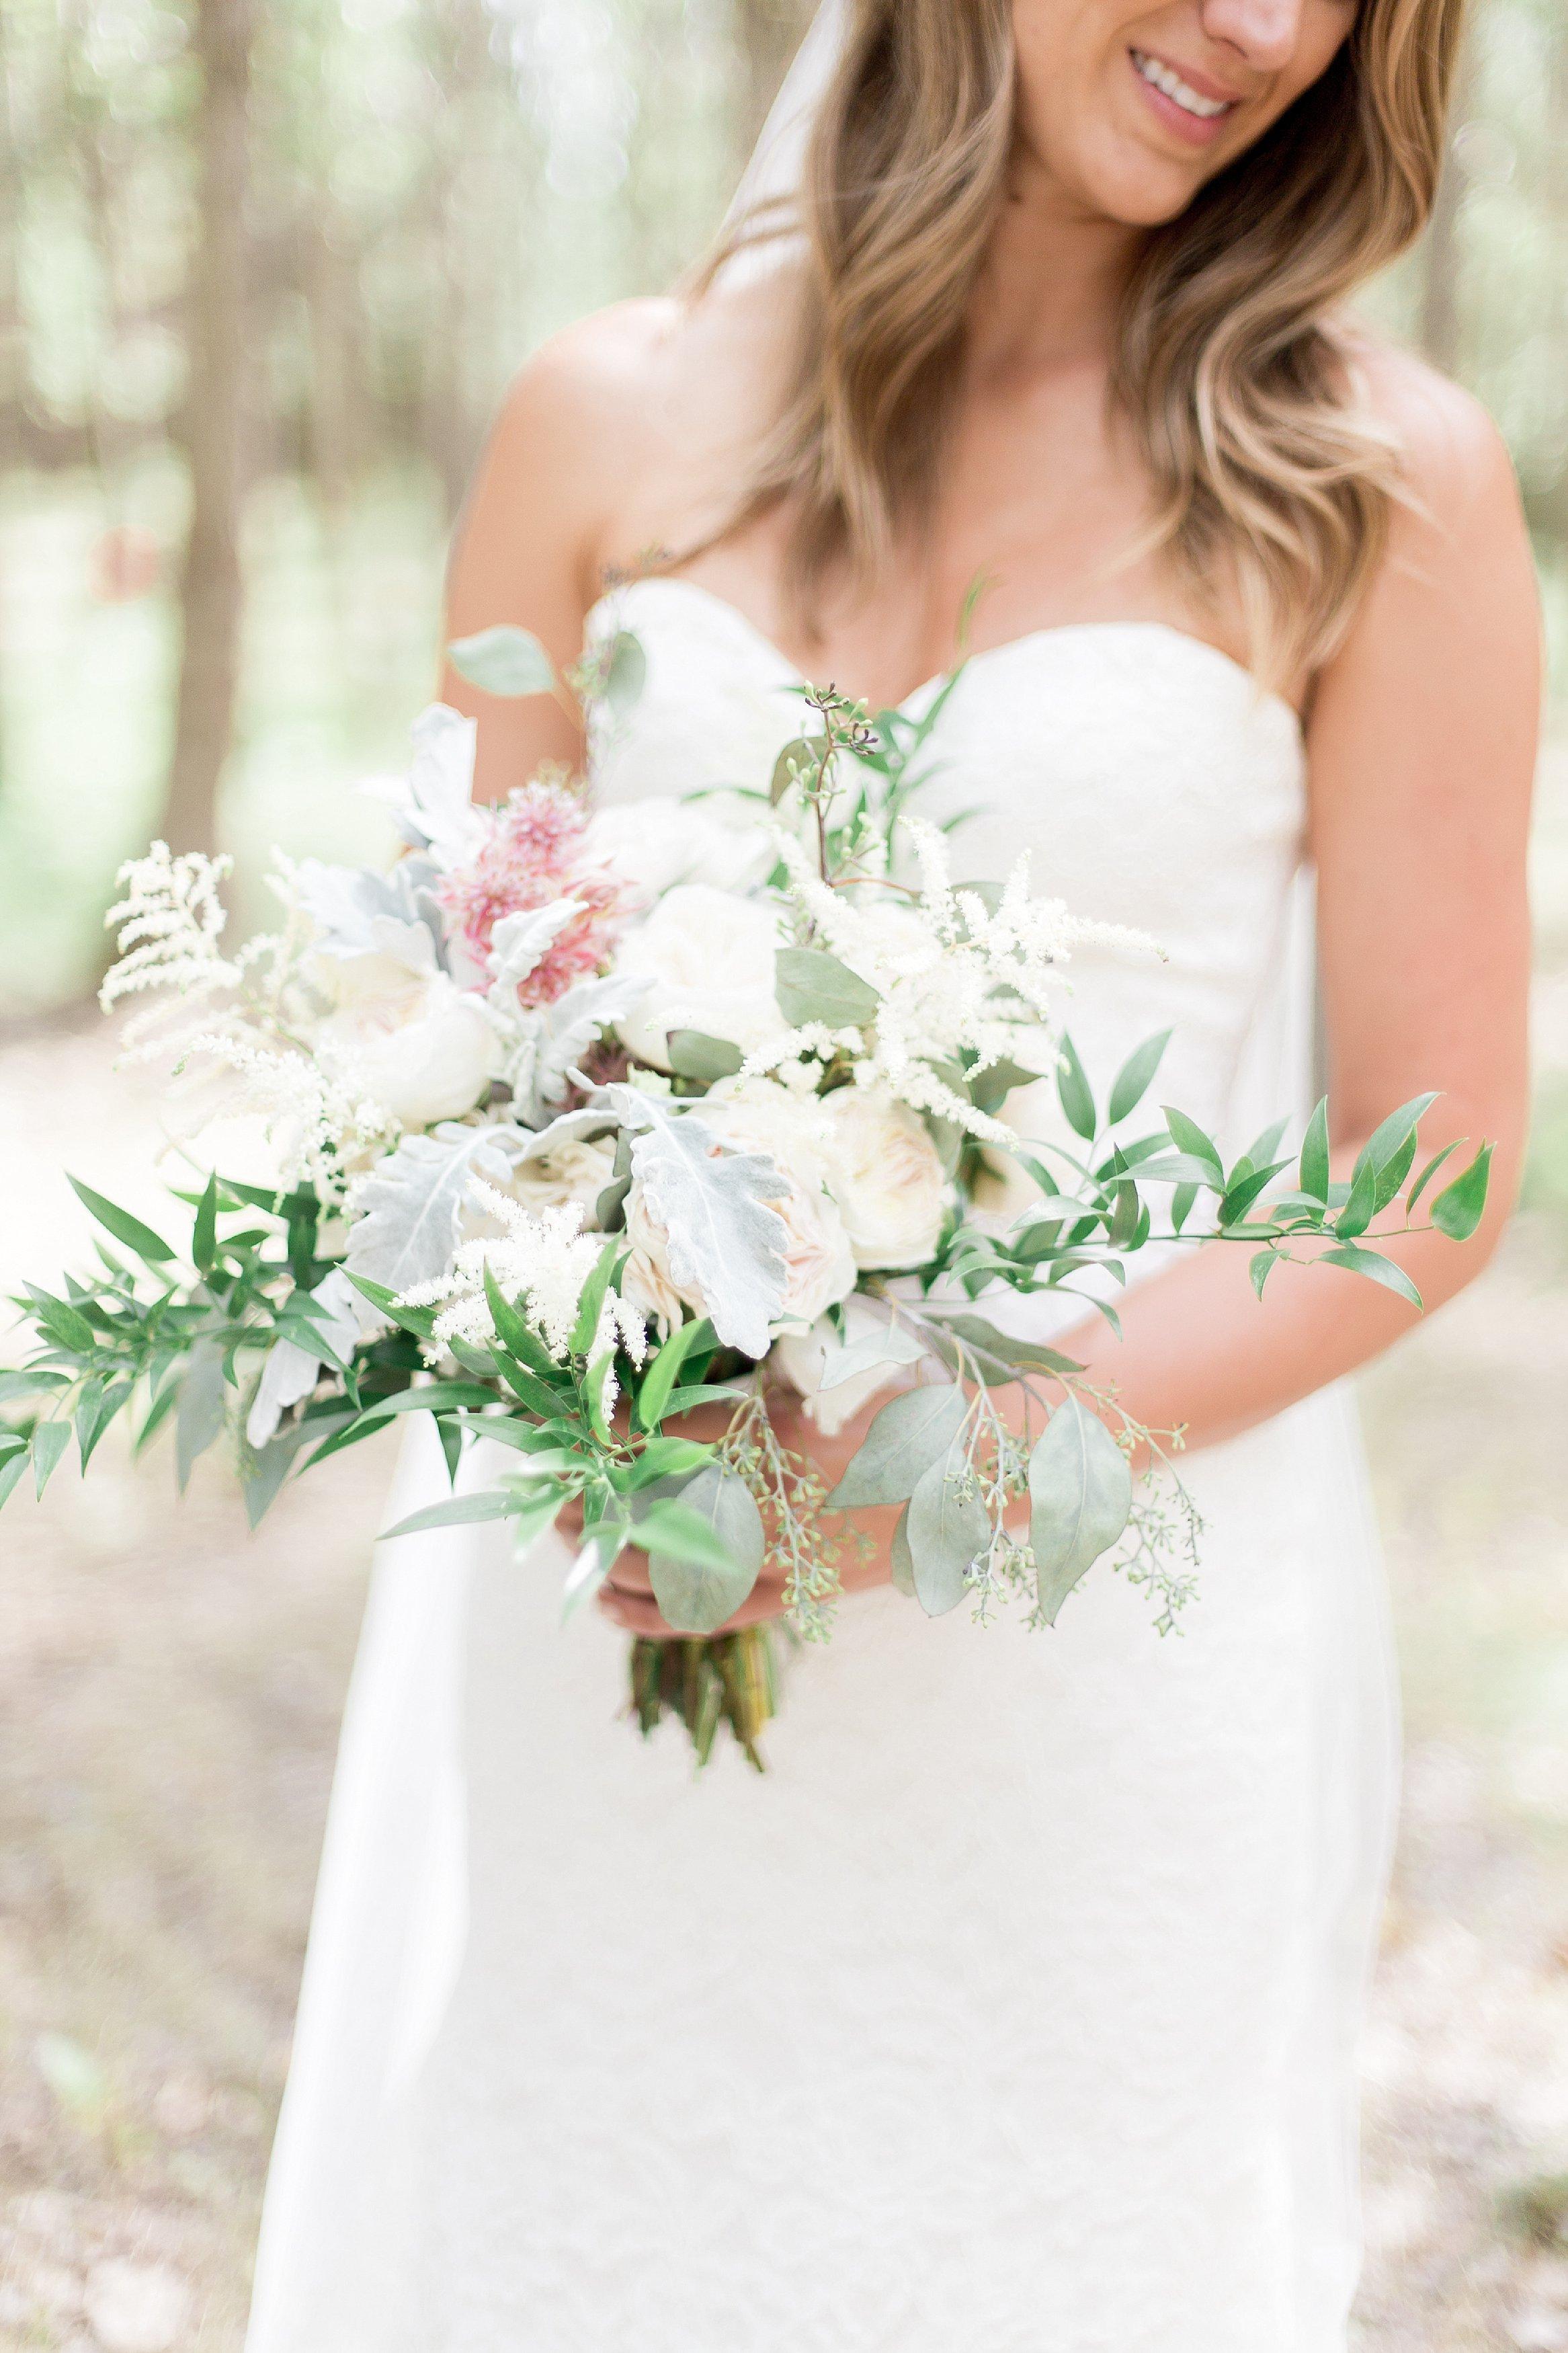 Winnipeg Wedding Photographer Keila Marie Photography   Bridal portraits   Bridal bouquet inspiration   Garden inspired wedding